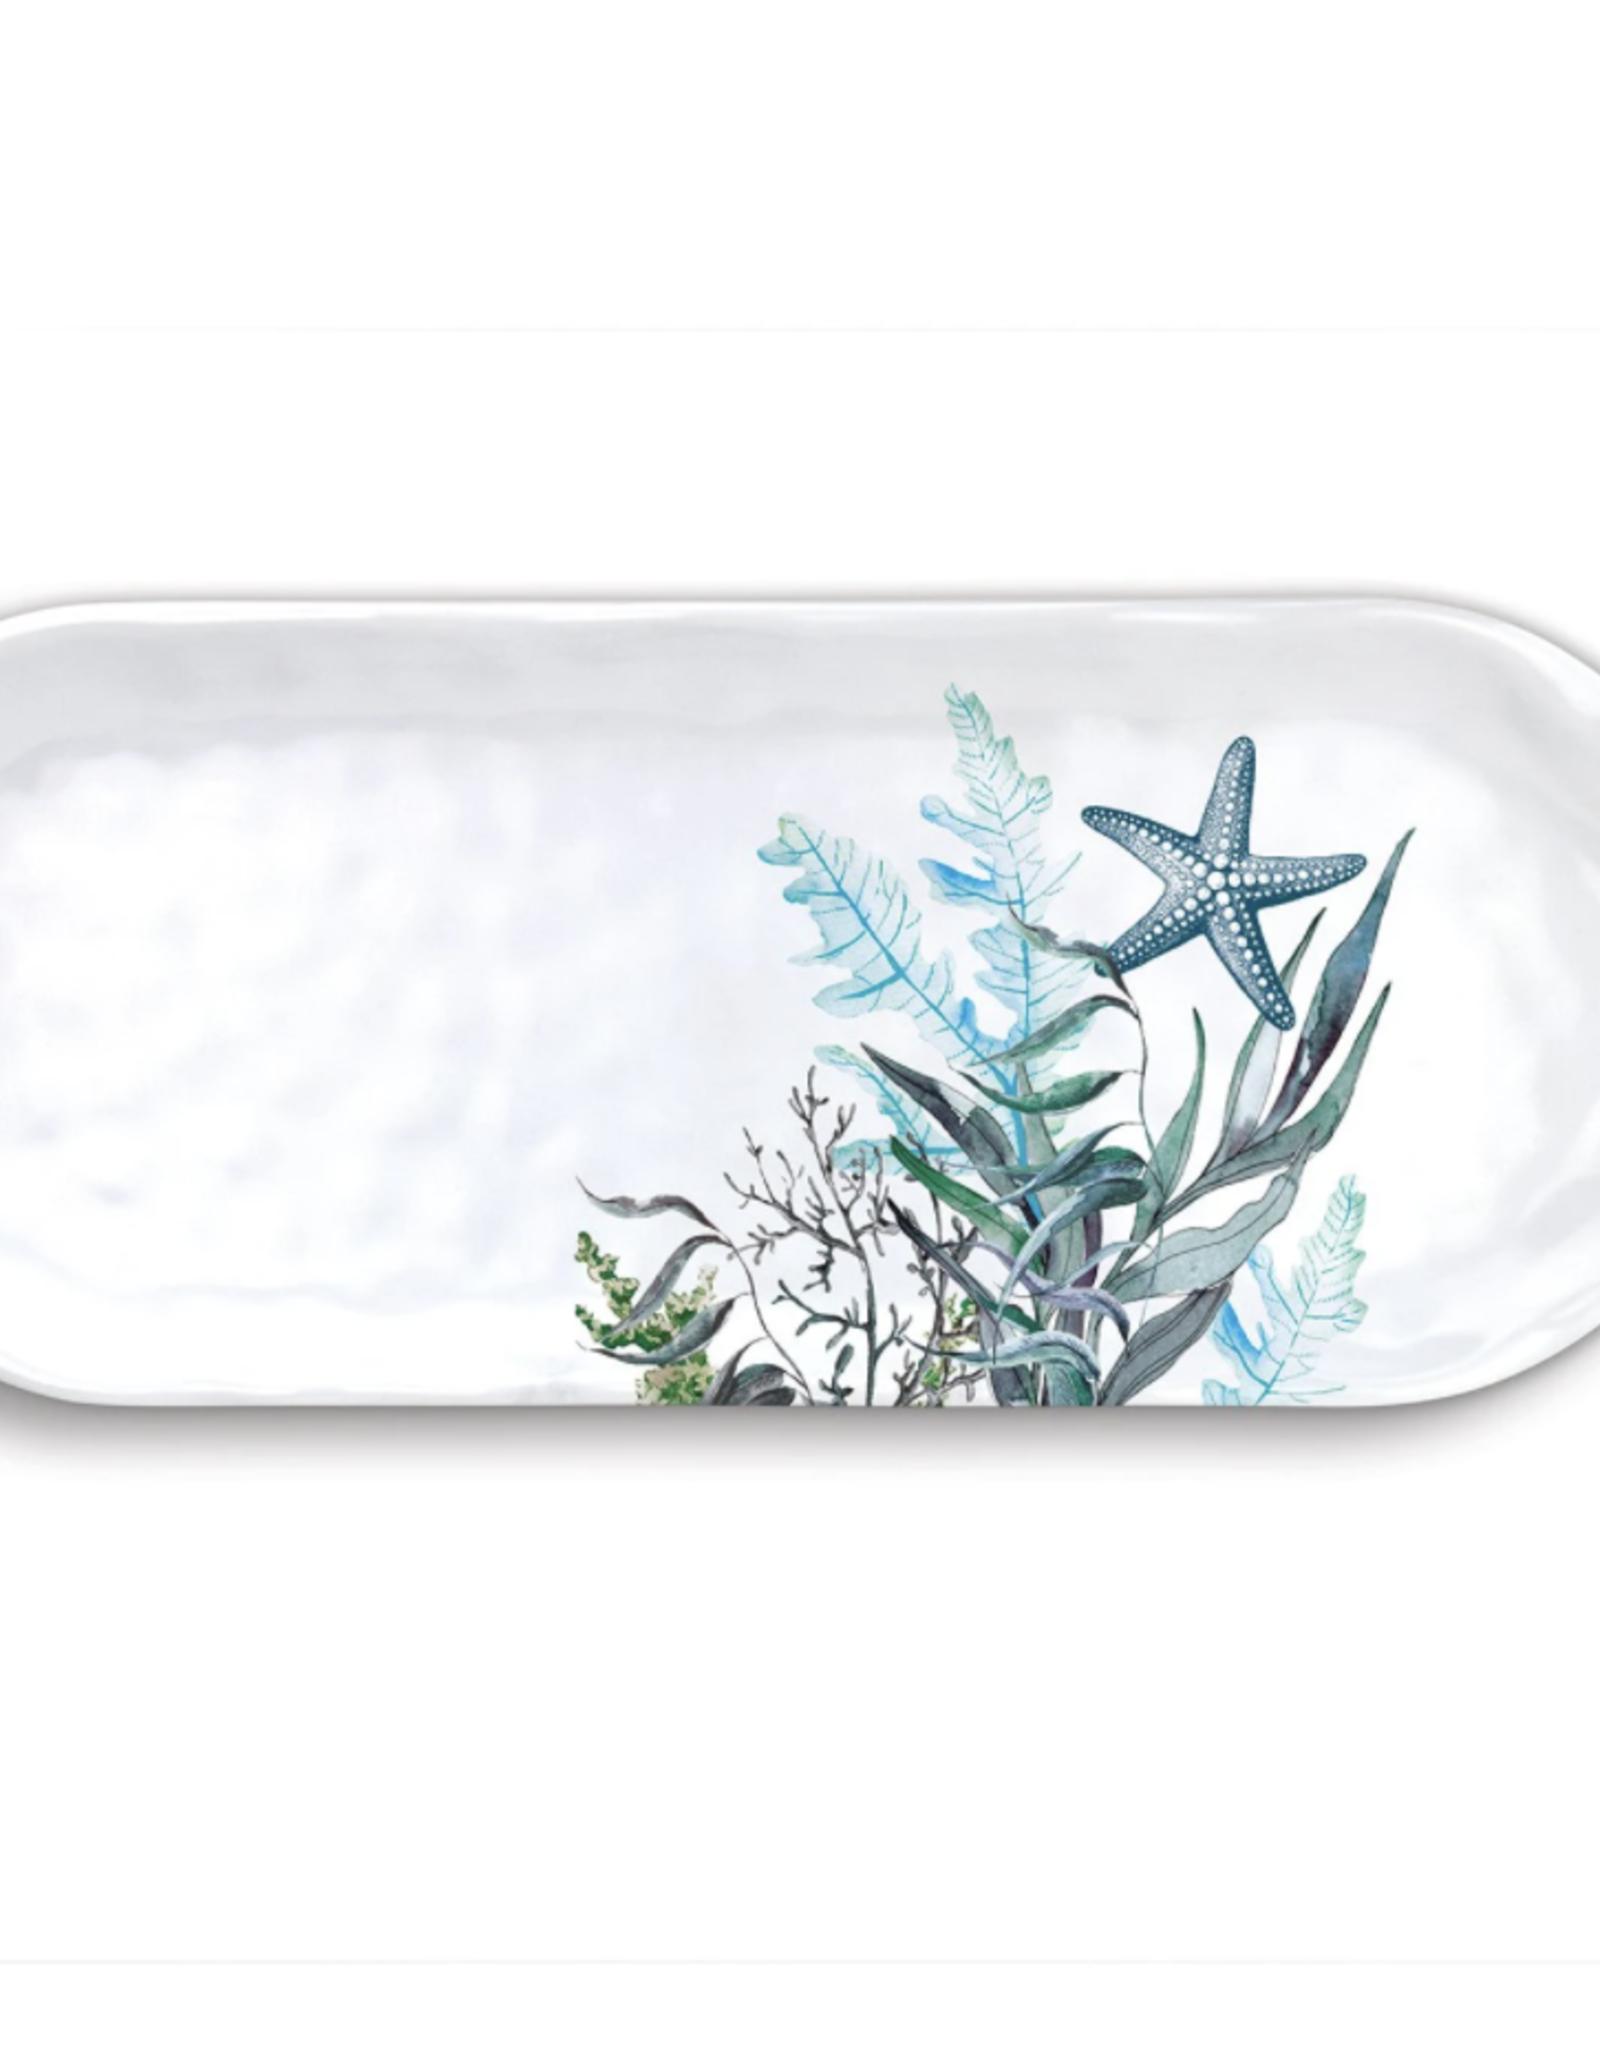 Michel Design Works Ocean Tide Accent Tray